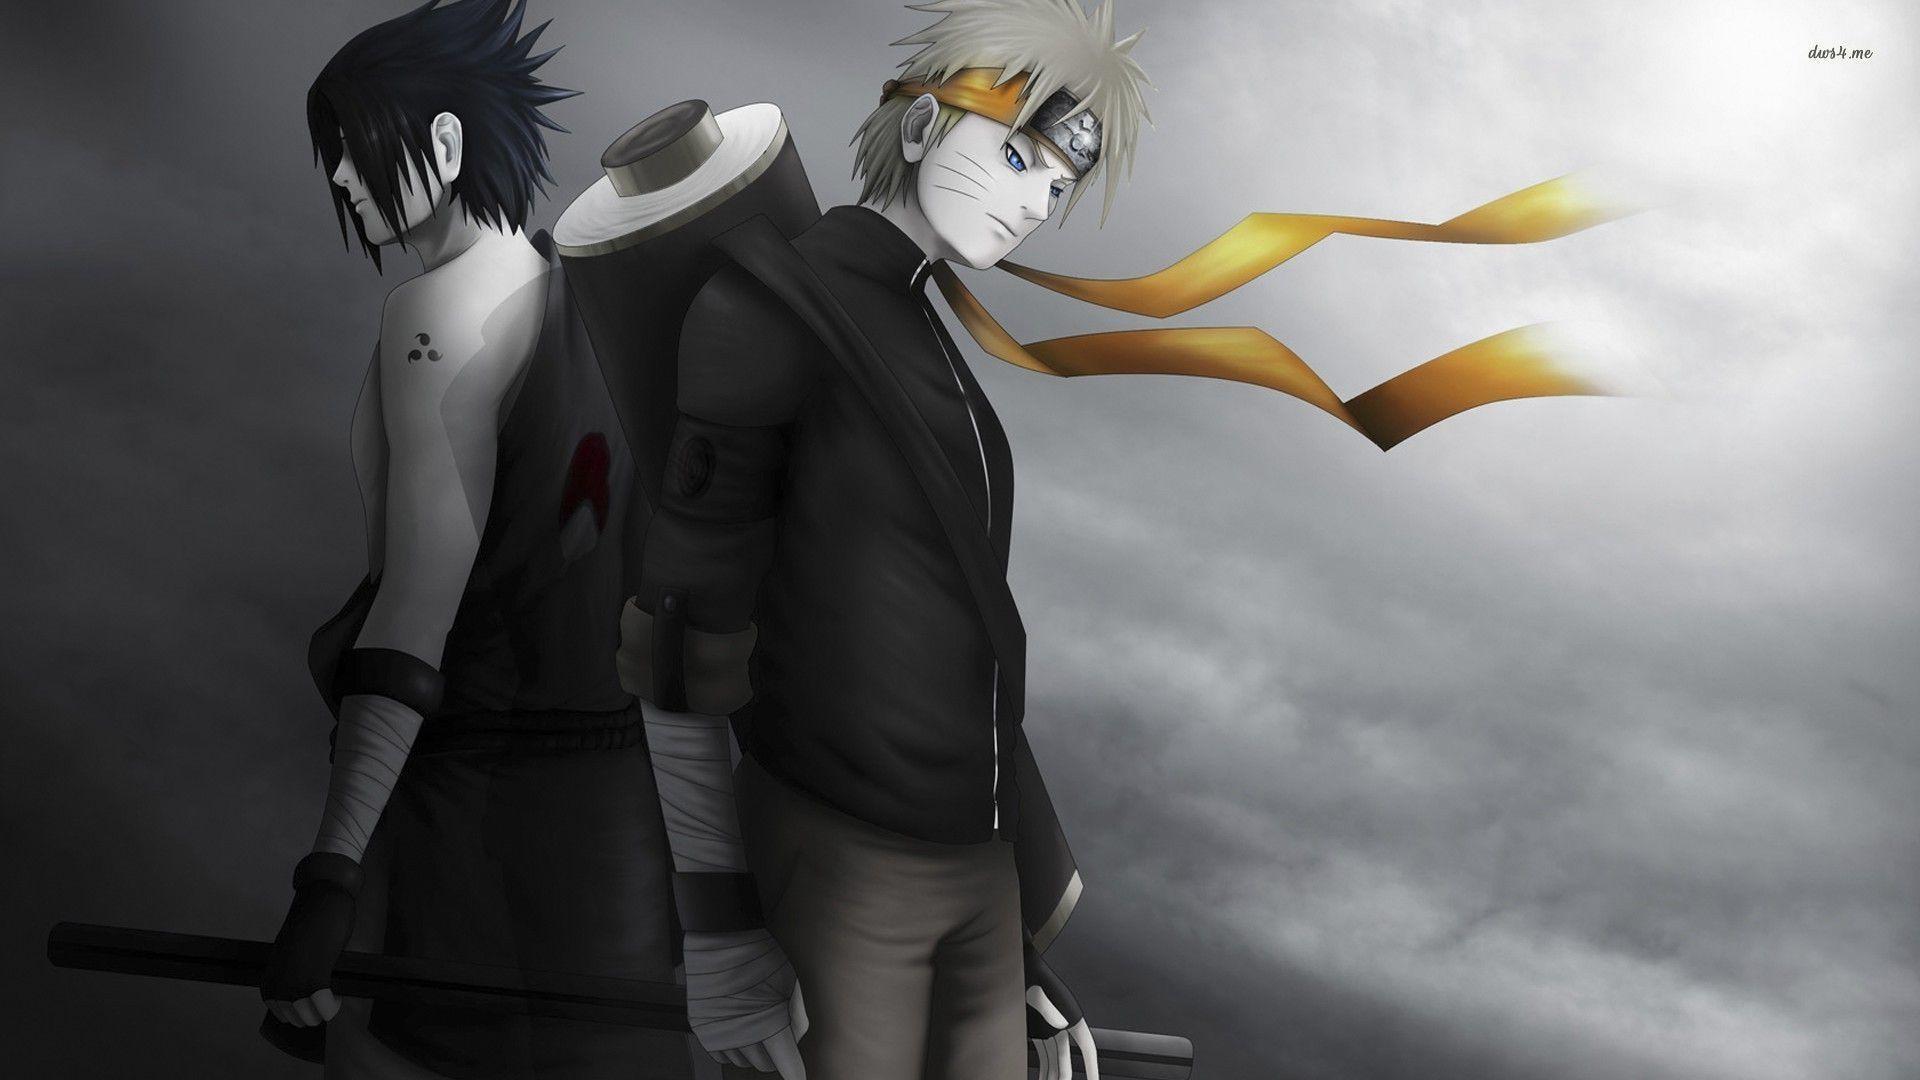 Unduh 83 Koleksi Wallpaper Naruto Kecil Hd HD Paling Keren